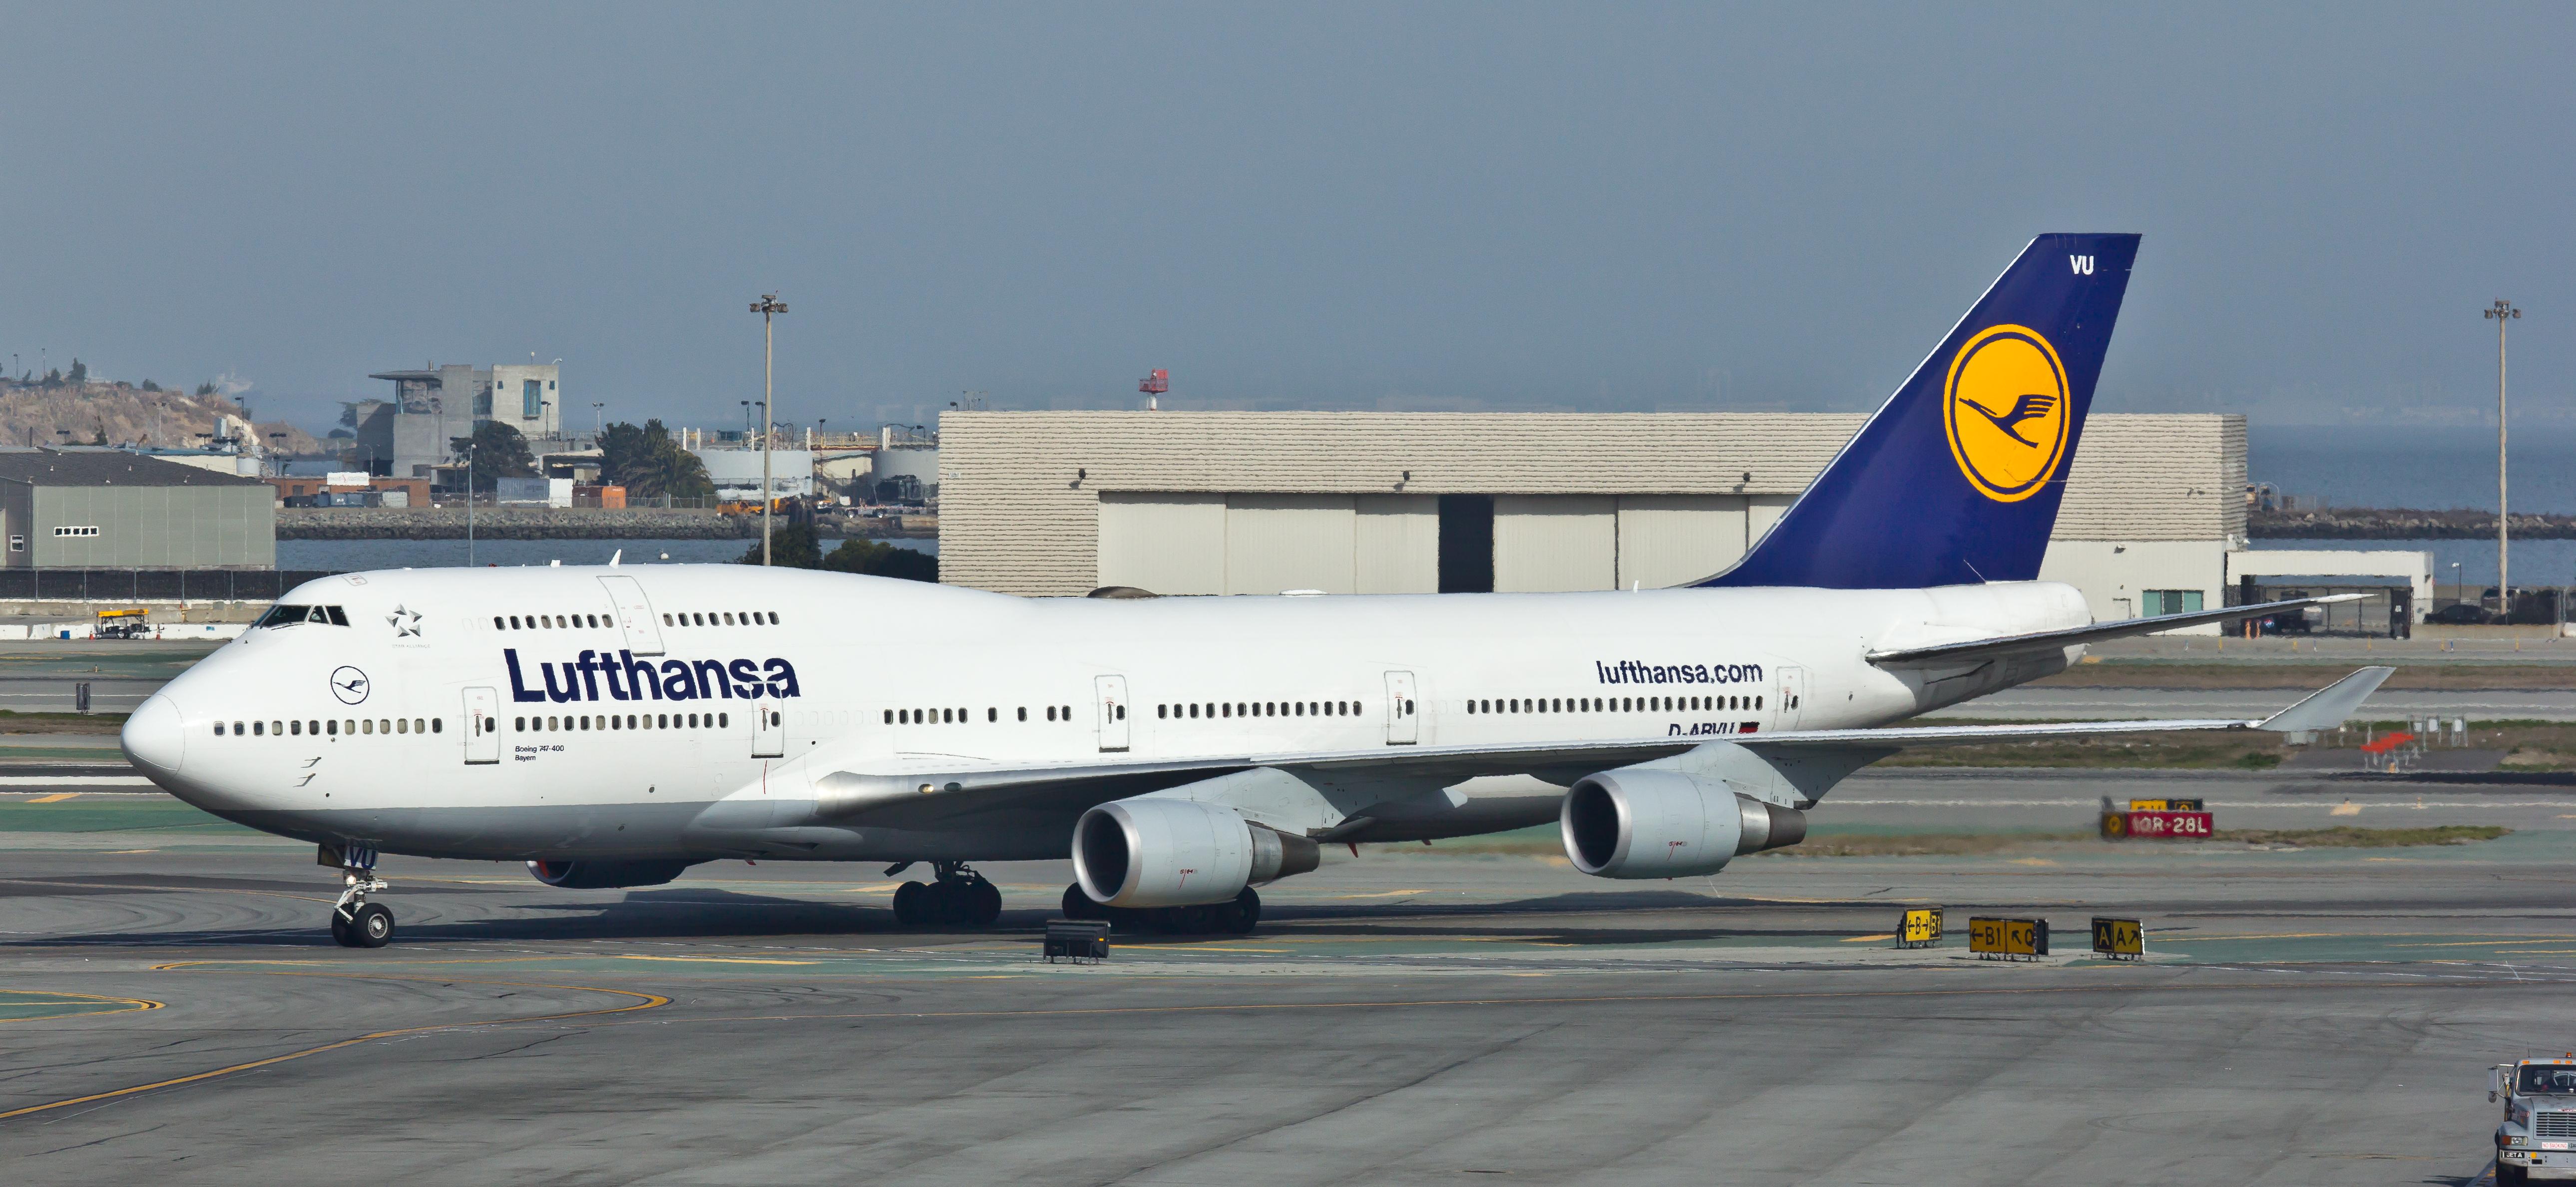 file lufthansa d abvu boeing 747 400 san francisco international airport. Black Bedroom Furniture Sets. Home Design Ideas